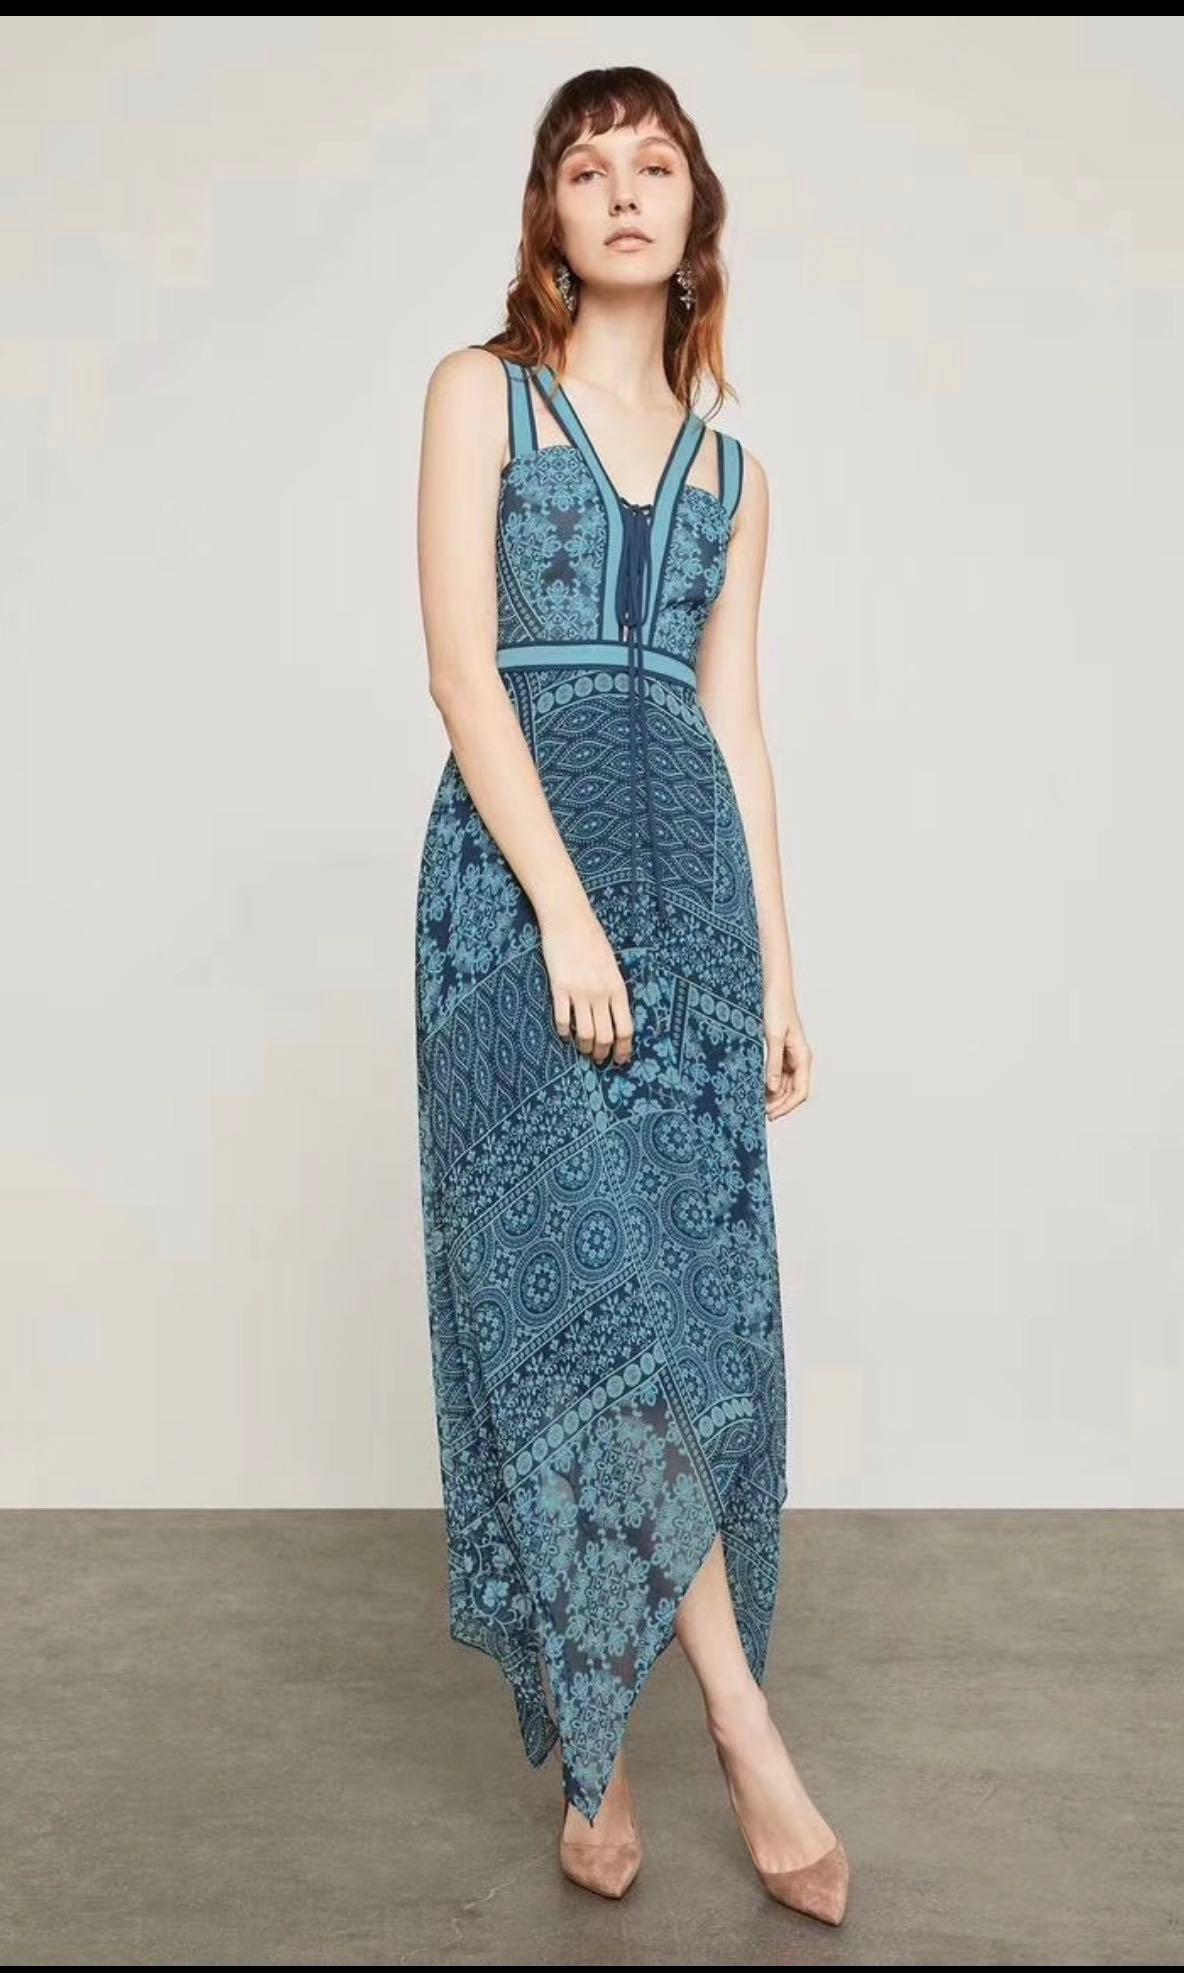 e6a7a4cd9939 BN BCBG Maxi Dress